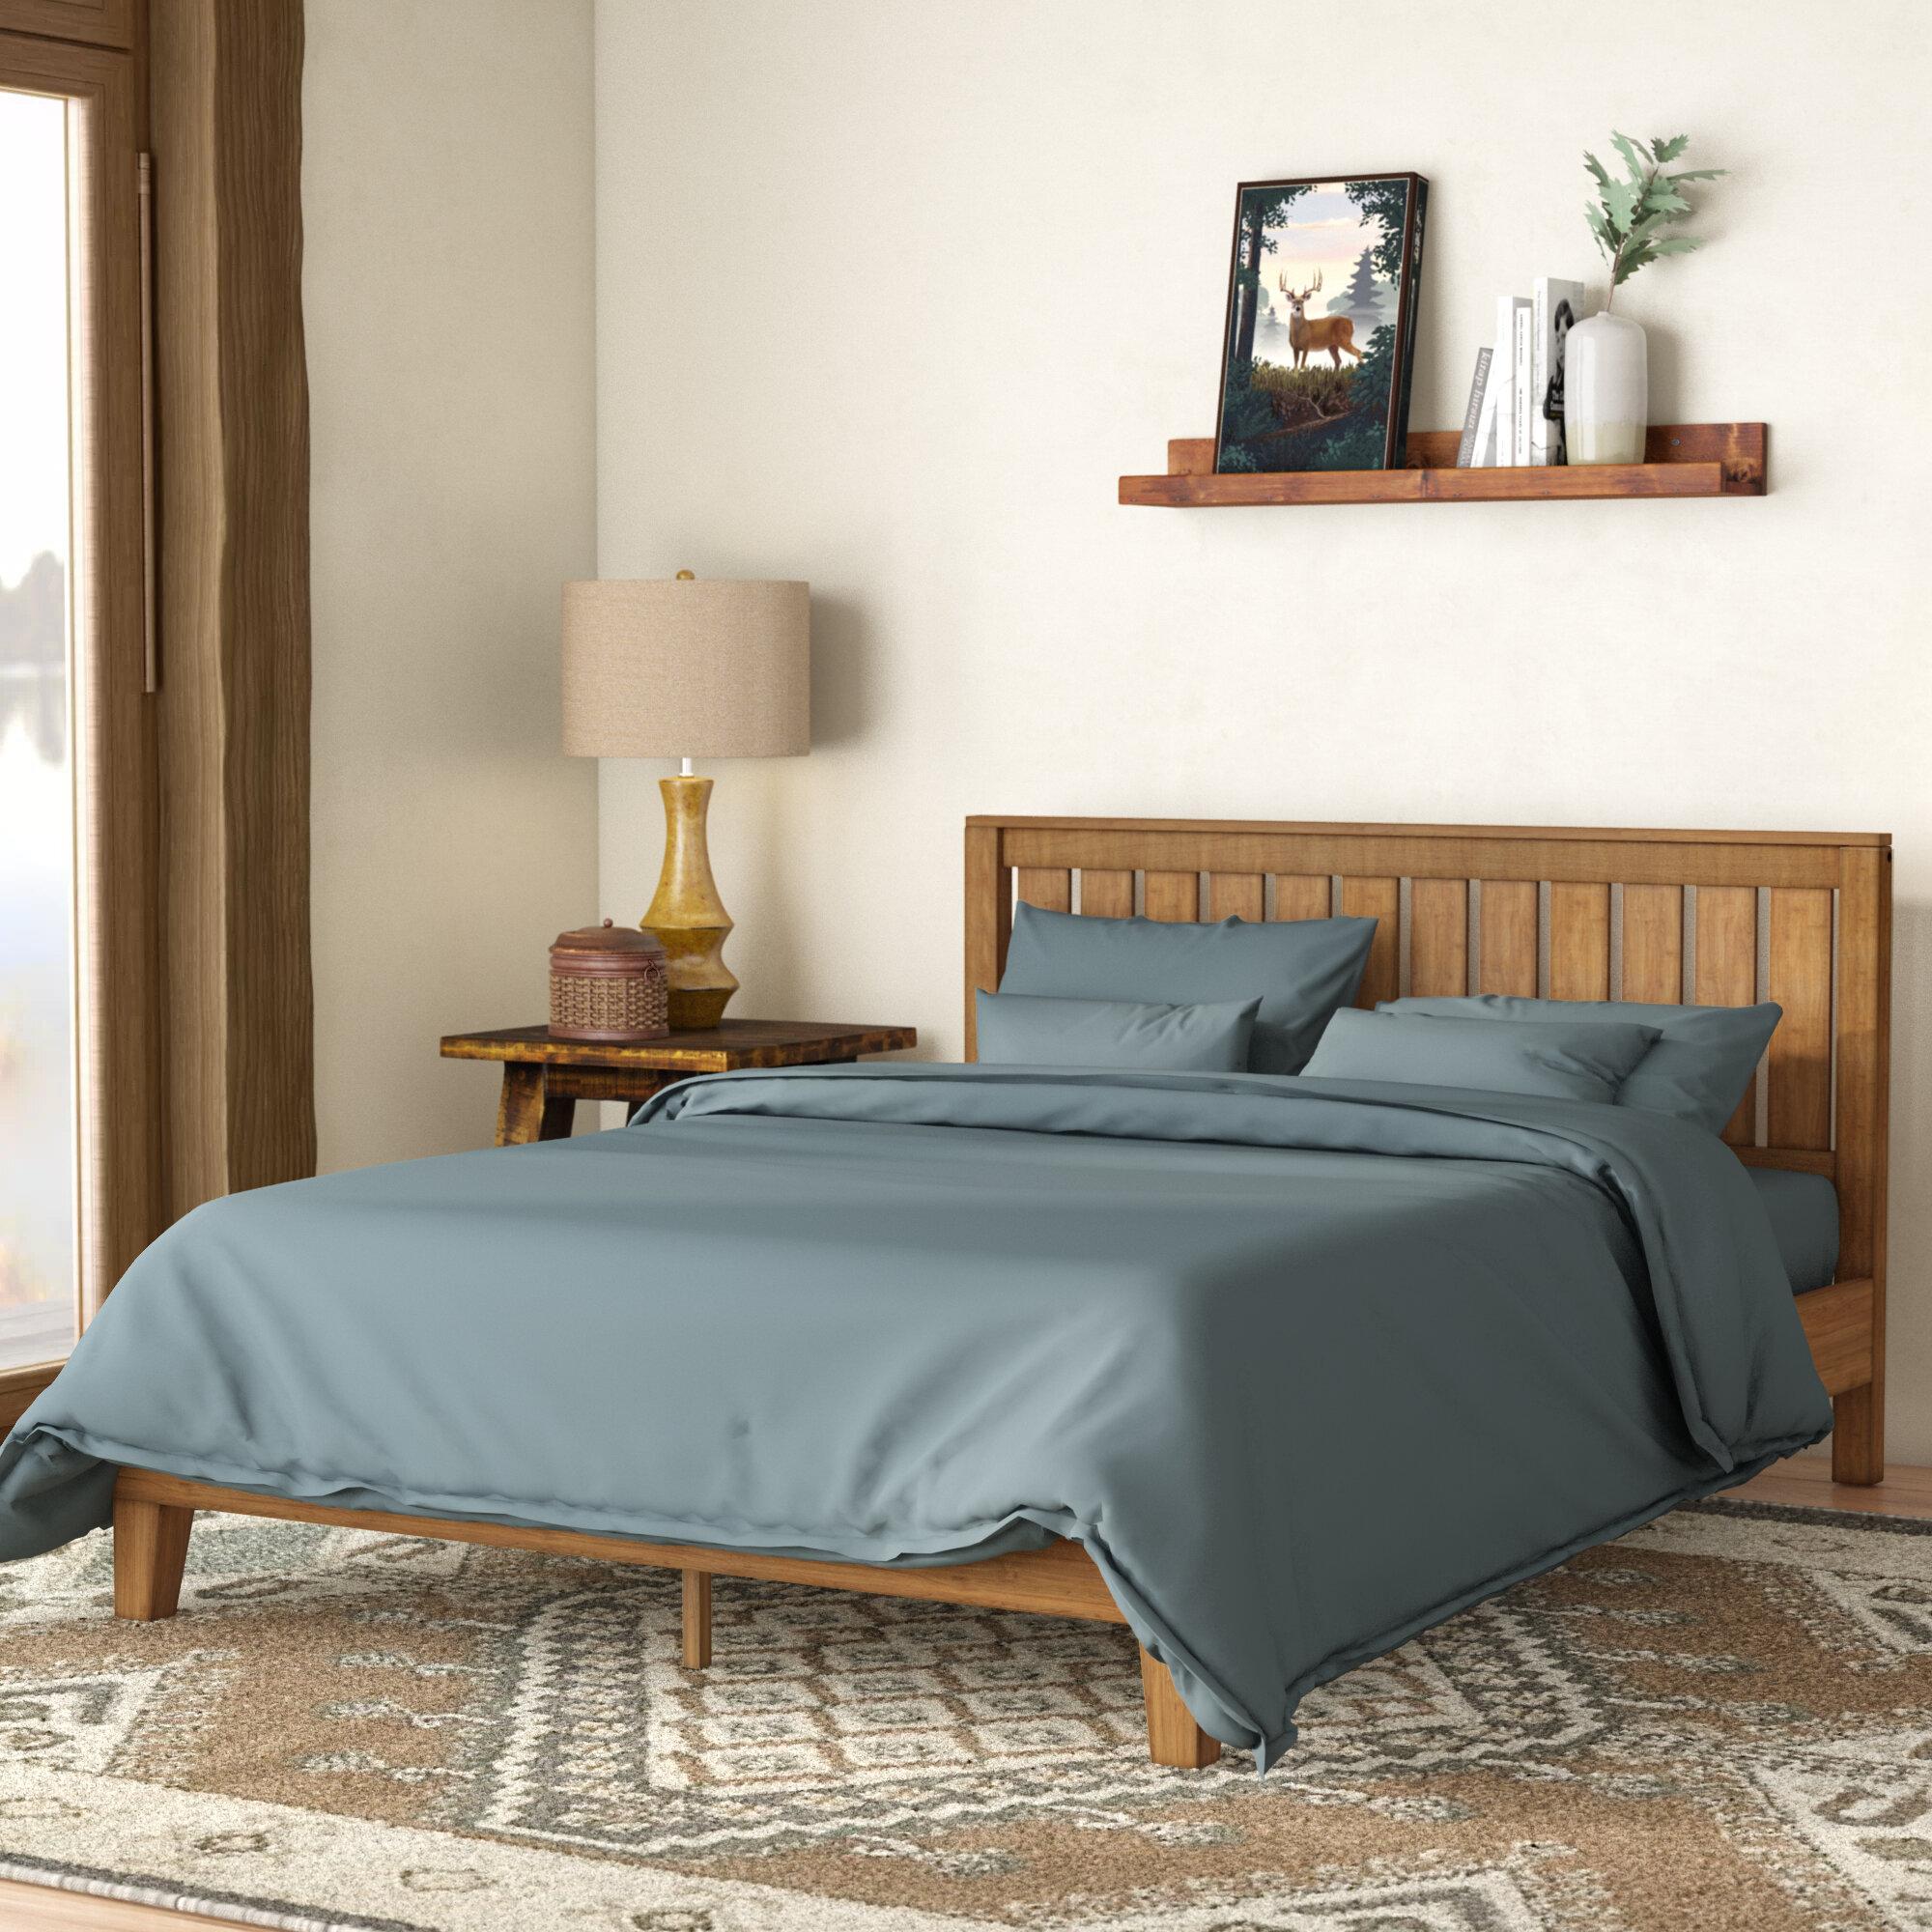 Brown Beds You Ll Love In 2021 Wayfair